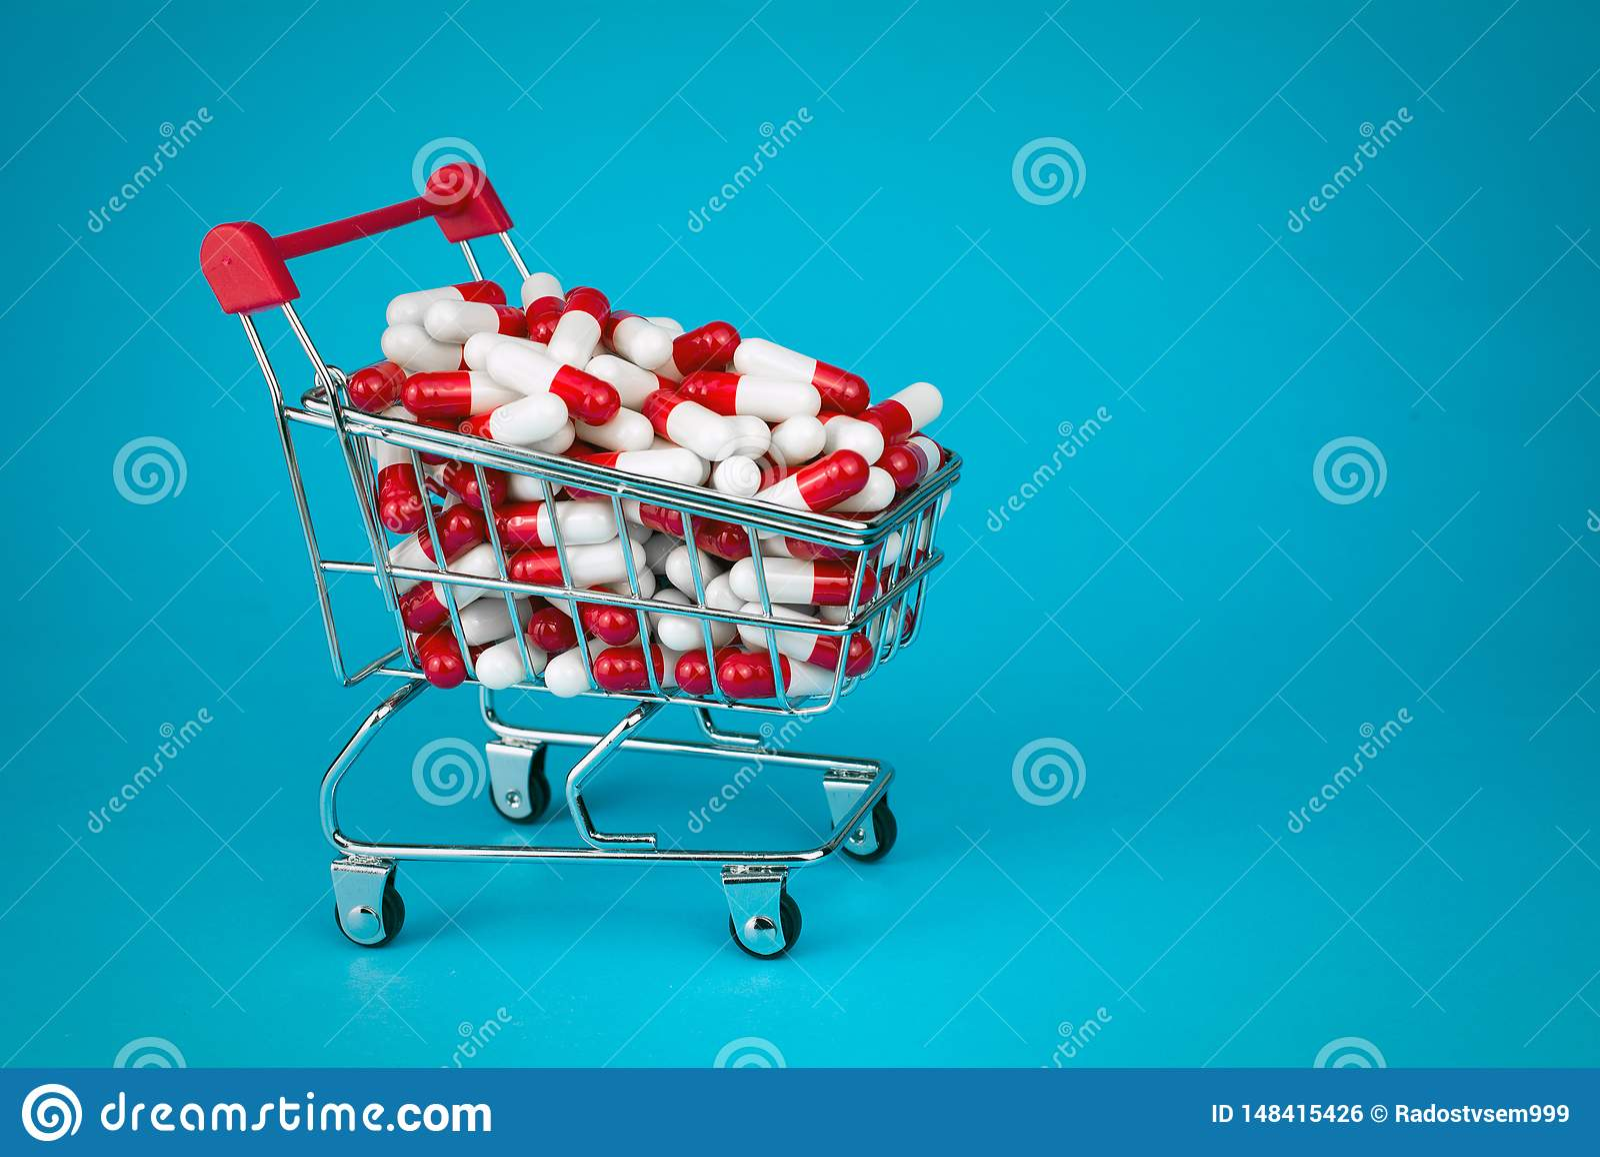 N?r du shoppar sp?rvagnen fyllde r?da medicinska kapslar